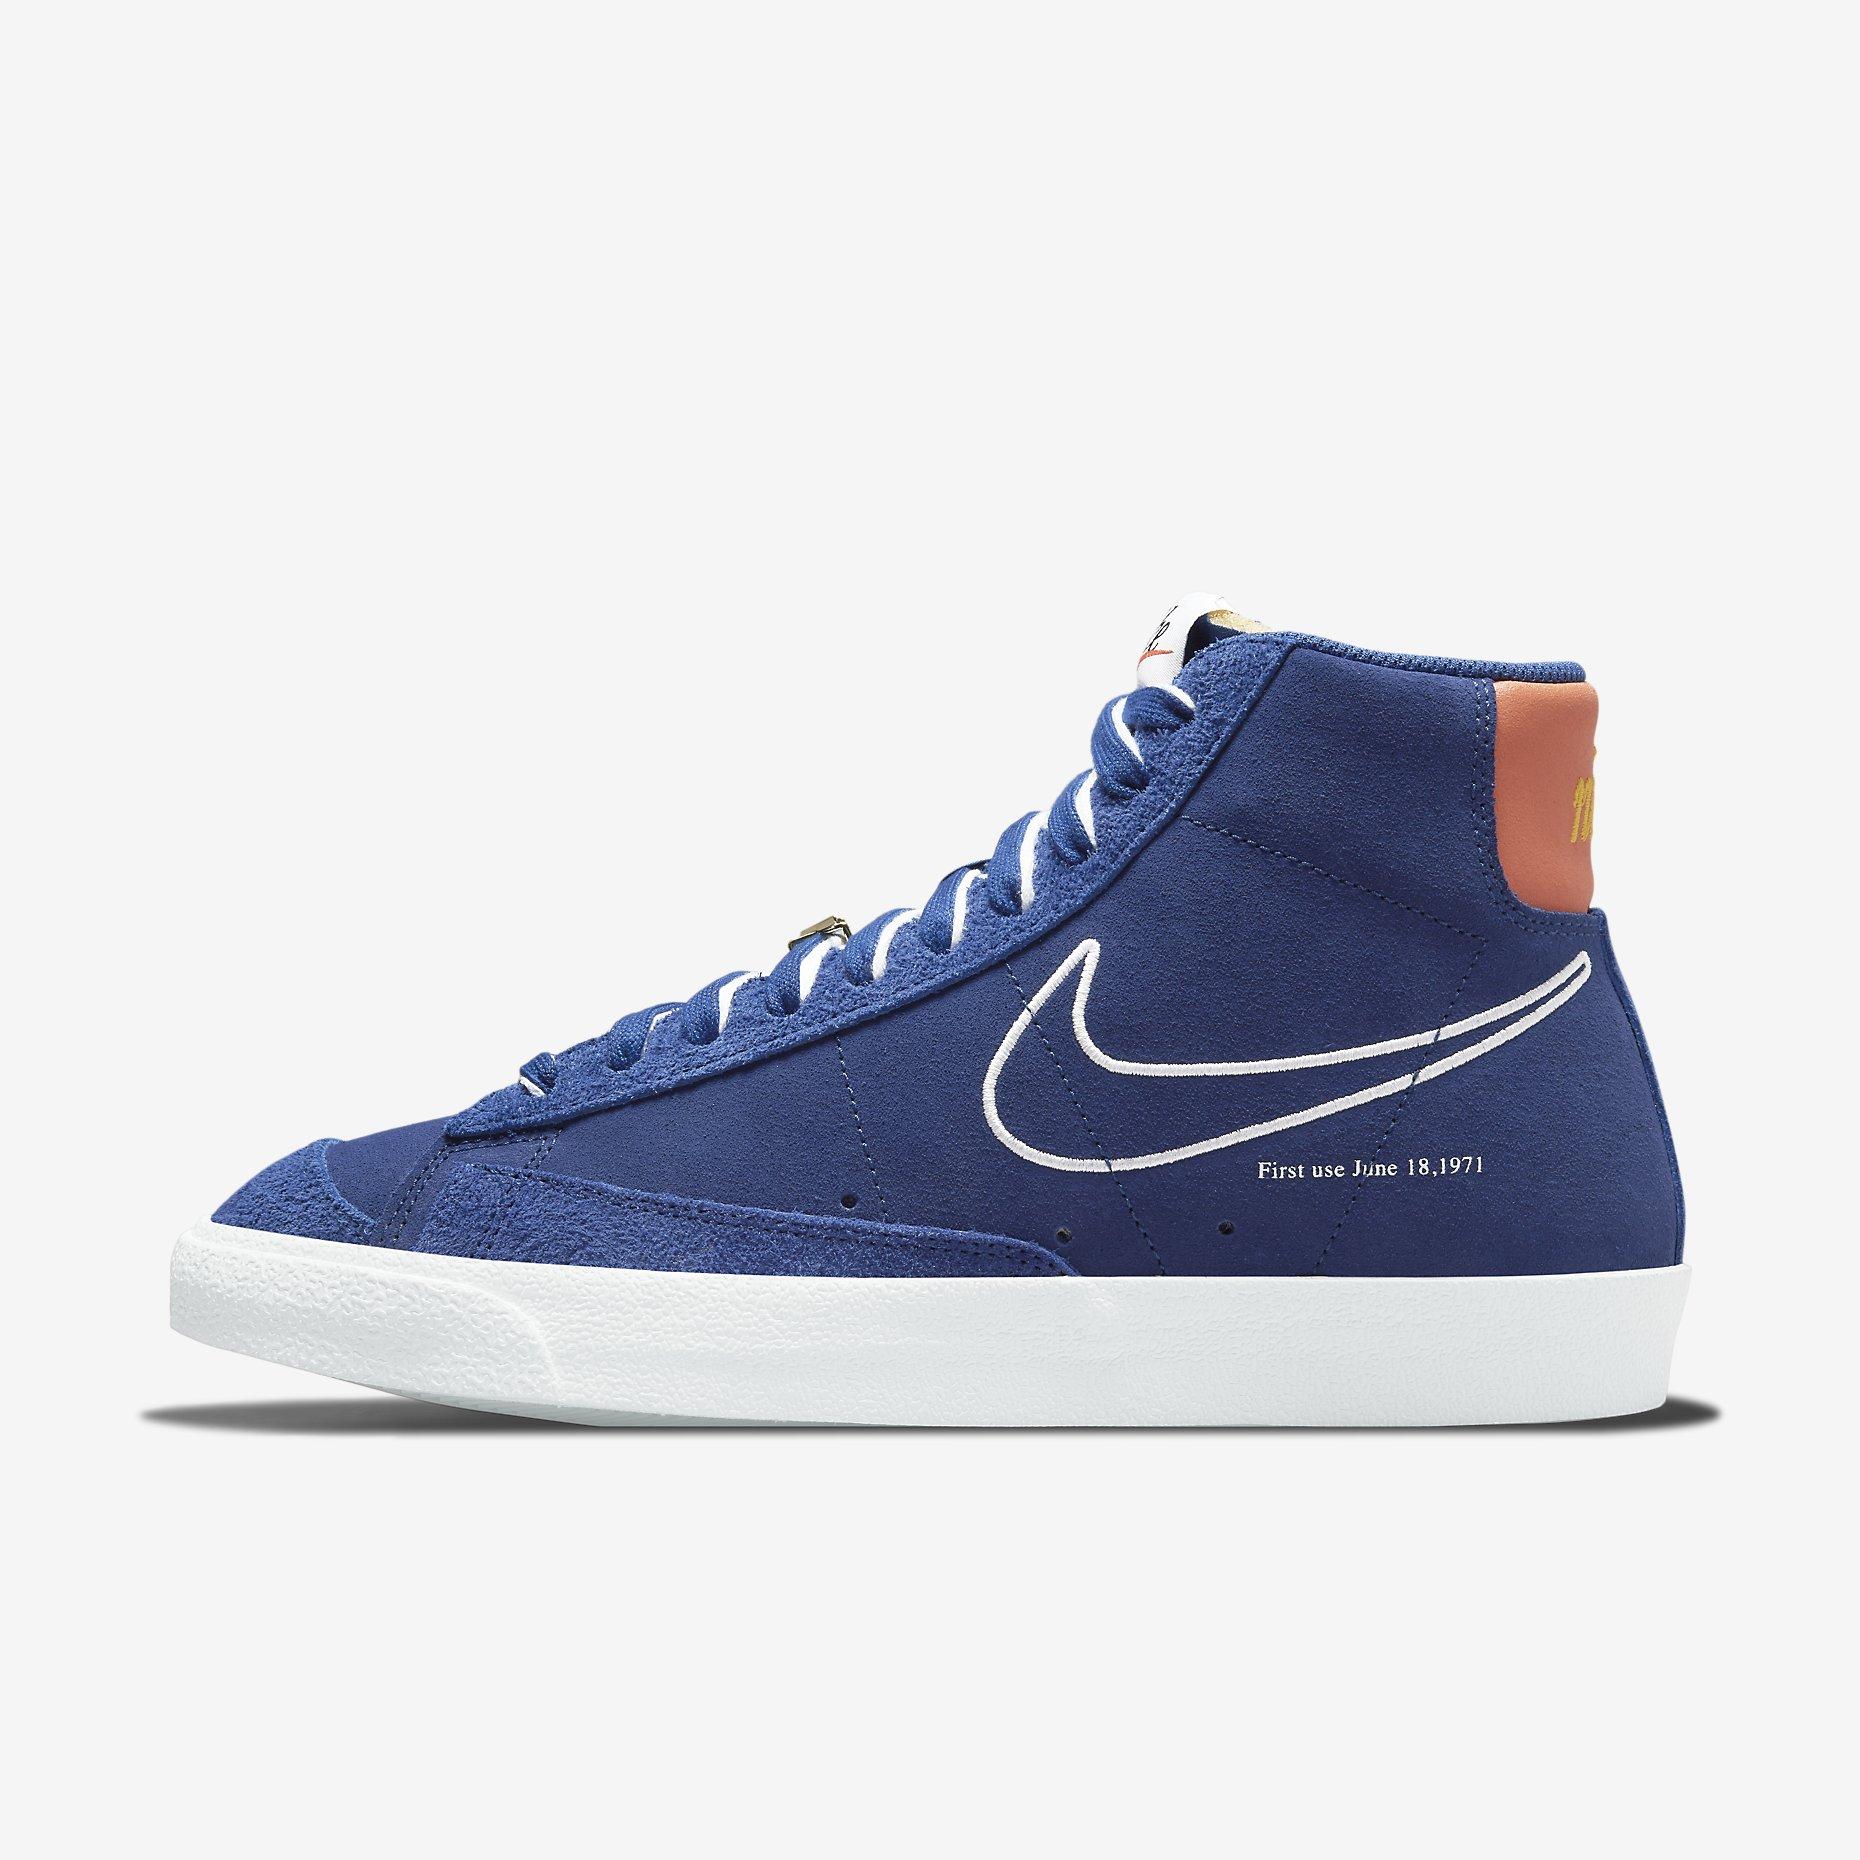 Nike Blazer Mid '77 'Deep Royal Blue' - First Use